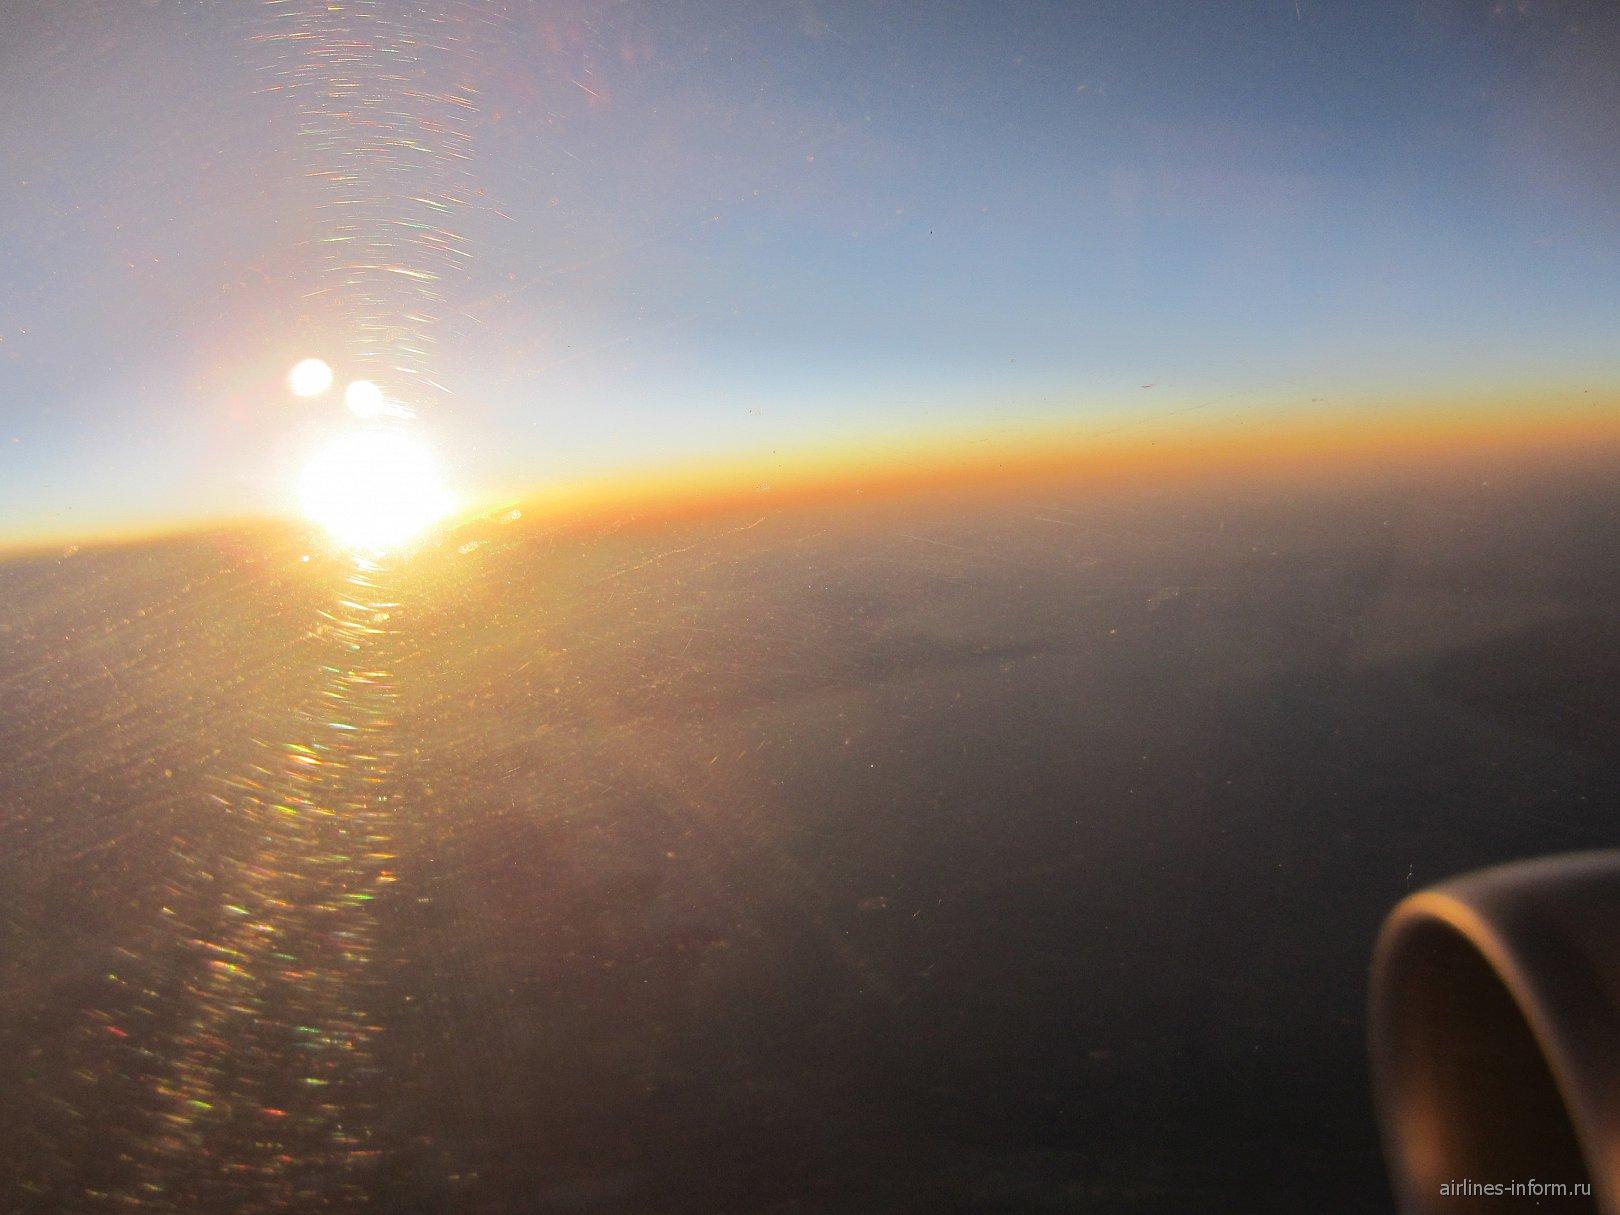 Рейс Екатеринбург-Шарджа авиакомпании Air Arabia